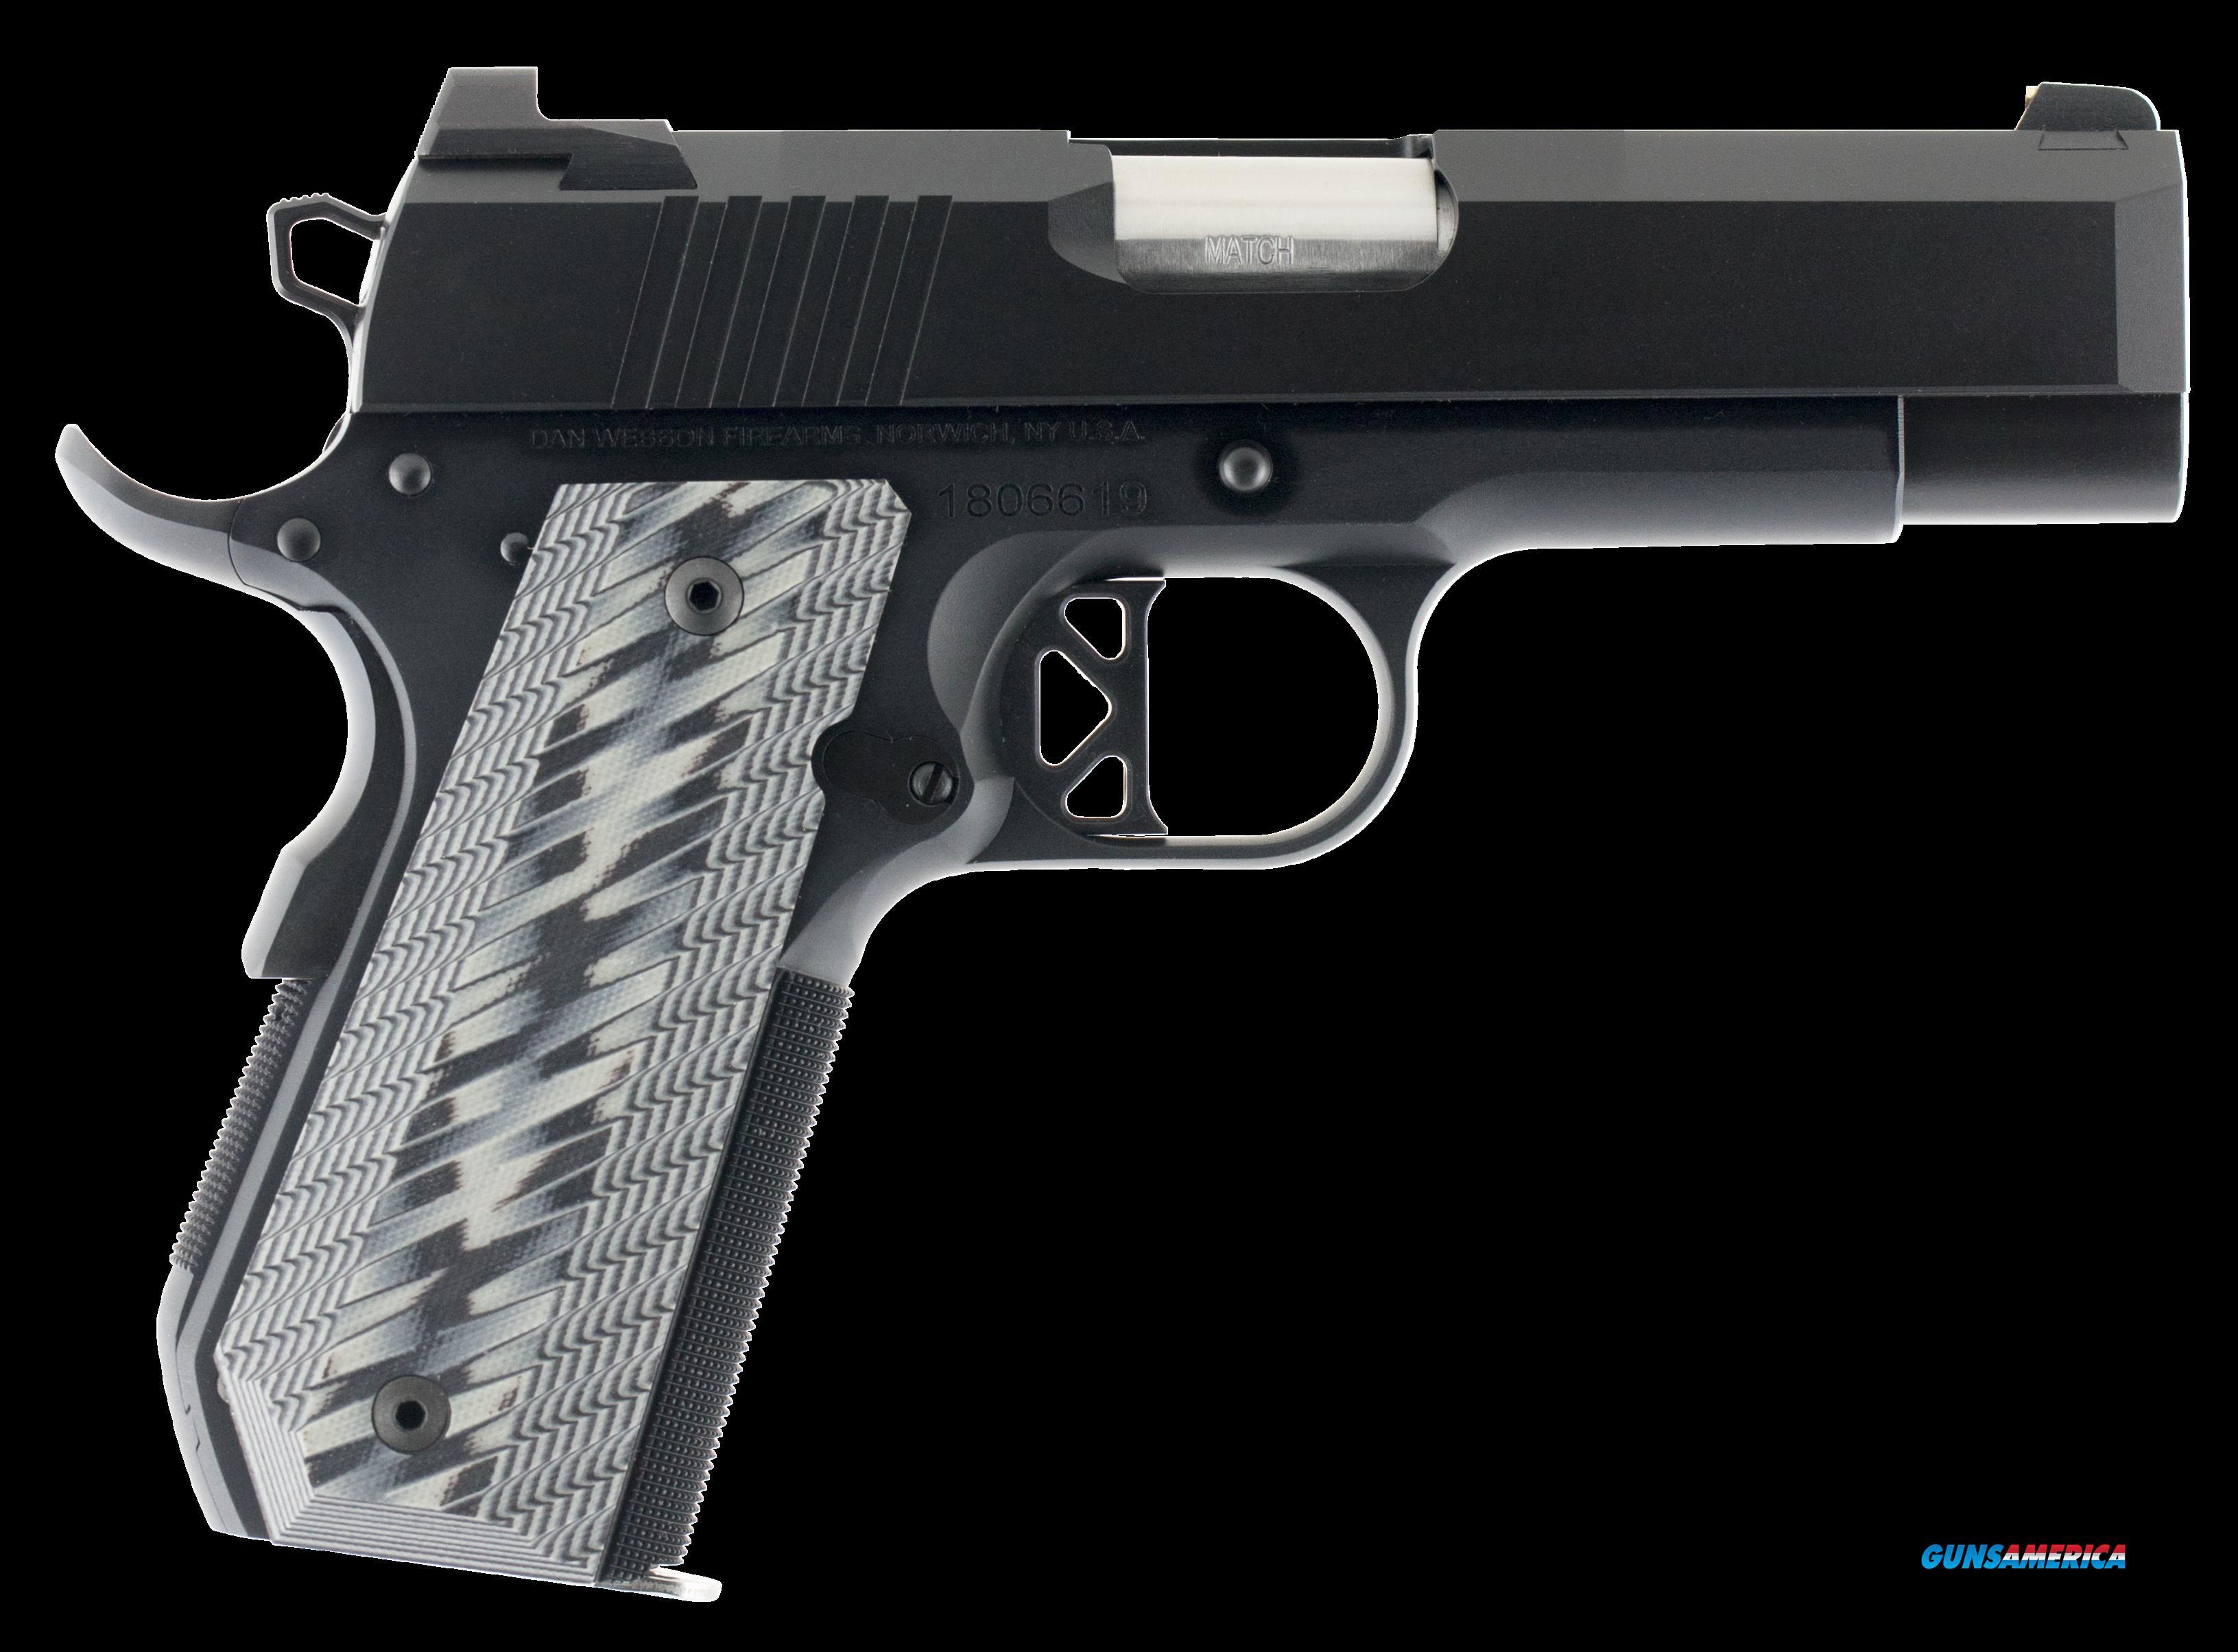 Cz Enhanced Commander, Dan 01883 Ecp Bobtail        45  4in Bull Ally Blk  Guns > Pistols > 1911 Pistol Copies (non-Colt)